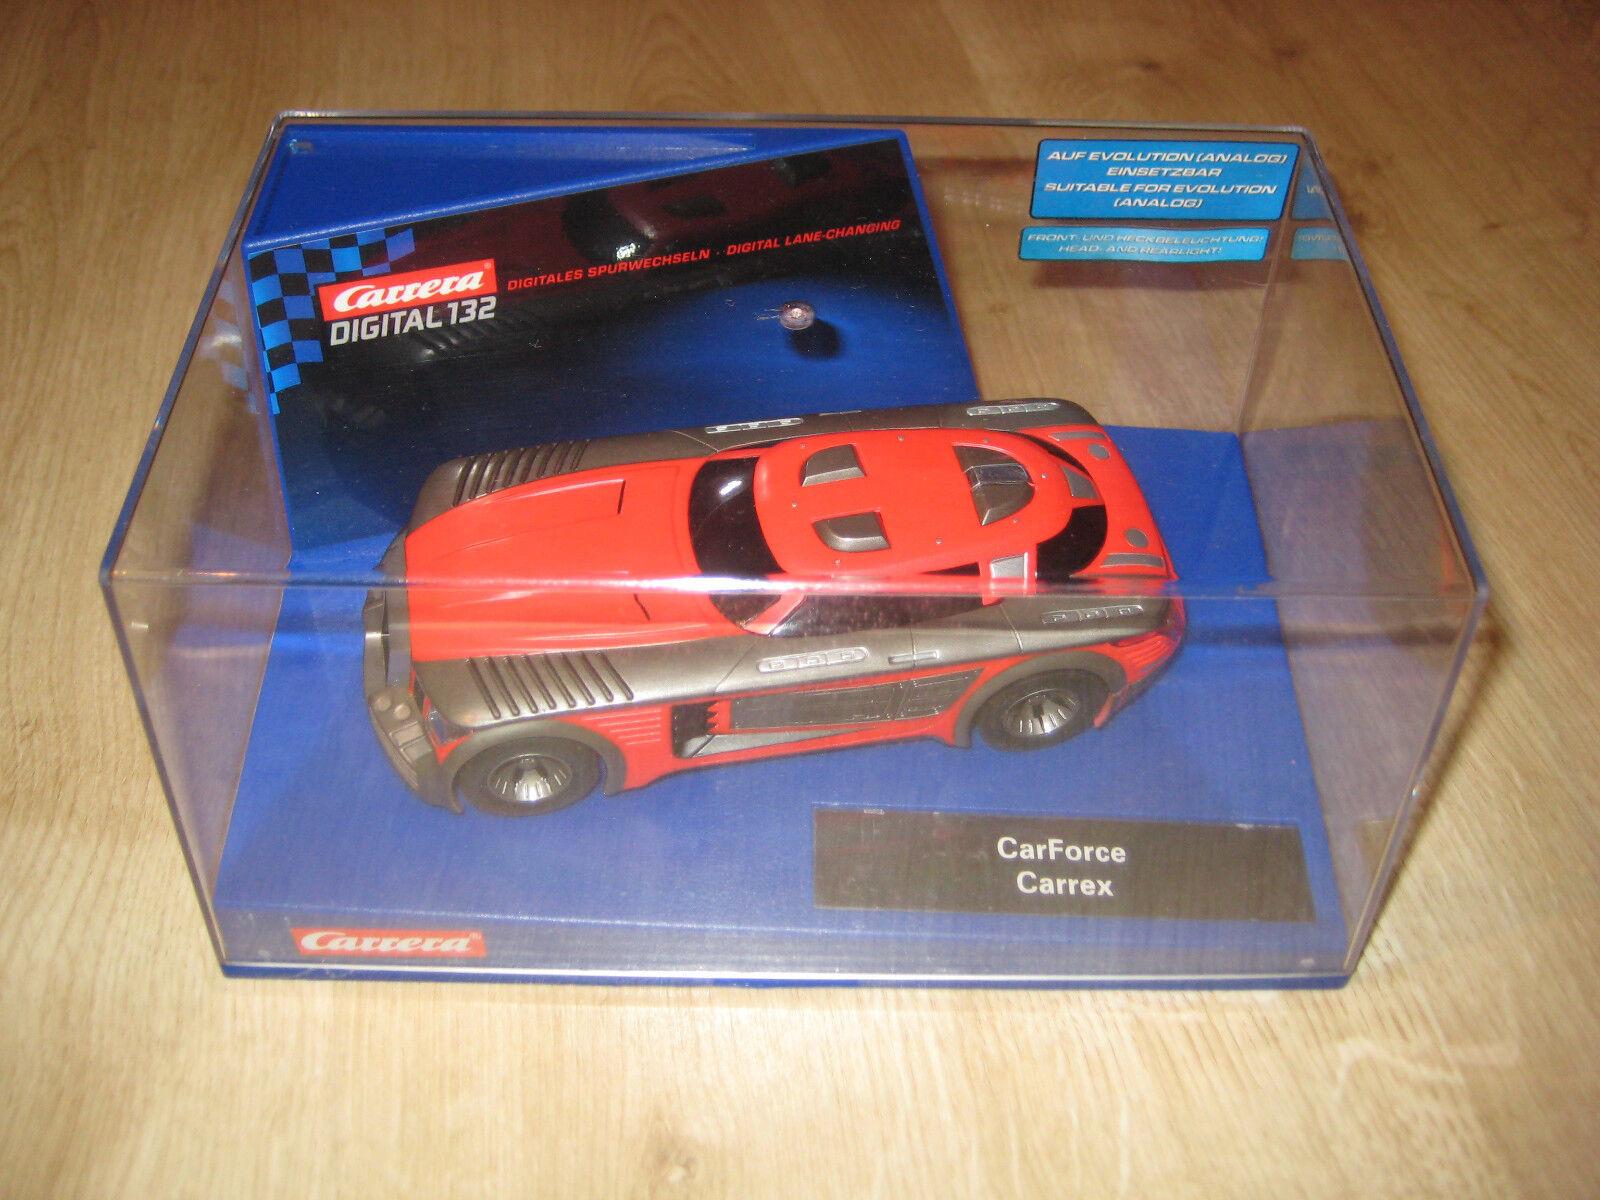 Carrera Digital 132 30416 CarForce Carrex NEU & OVP